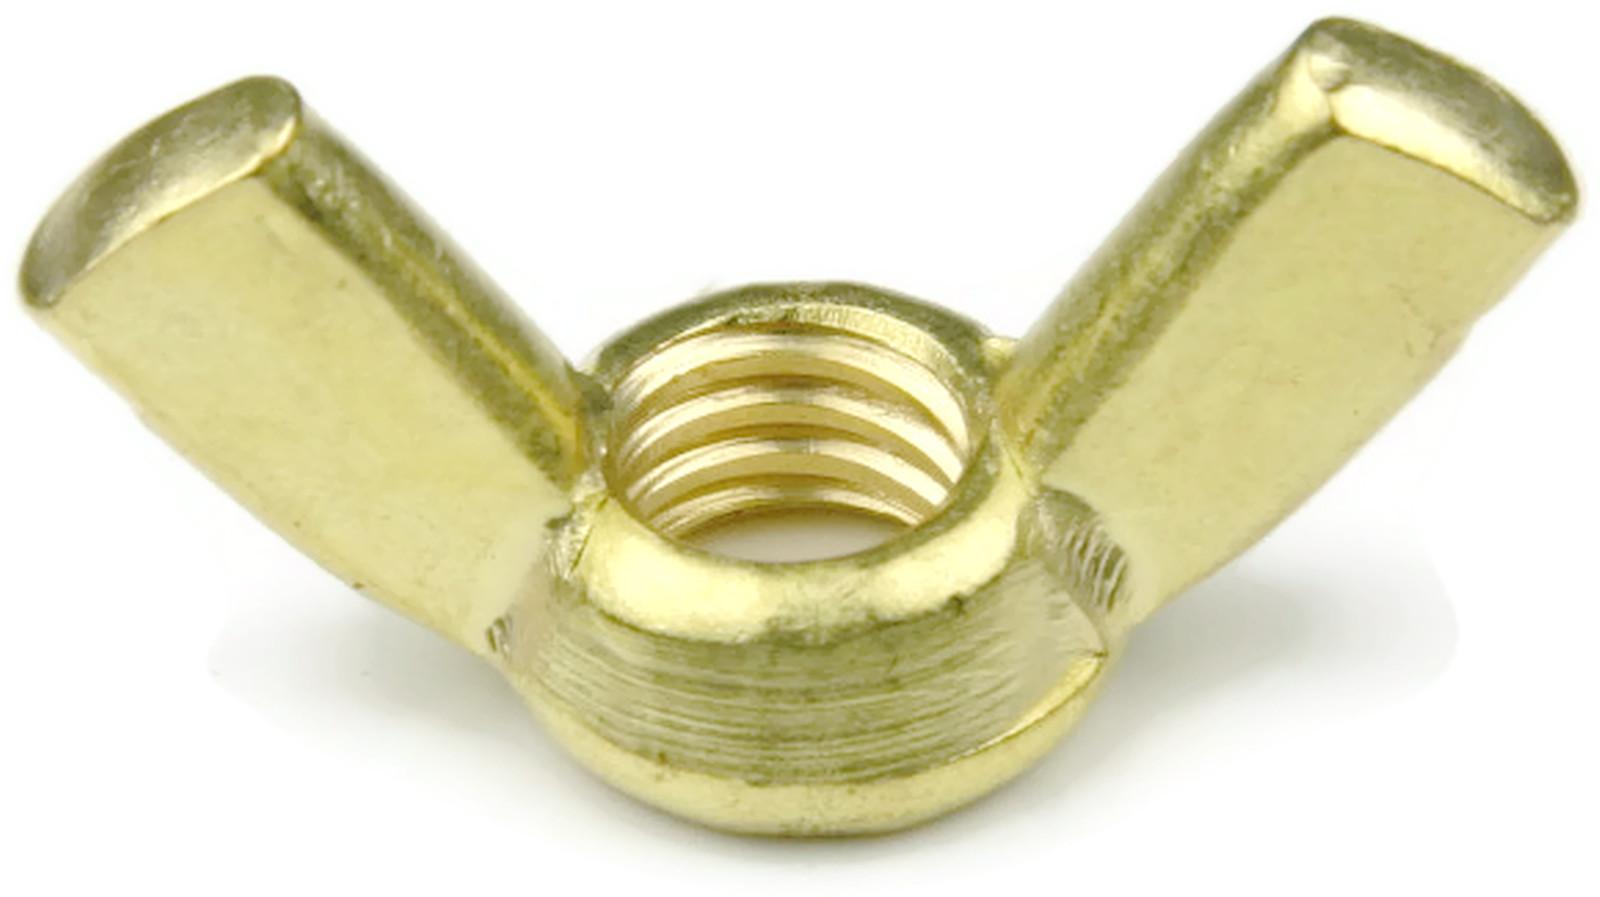 Brass Wing Nut Unc 1 4 20 Qty 25 Ebay